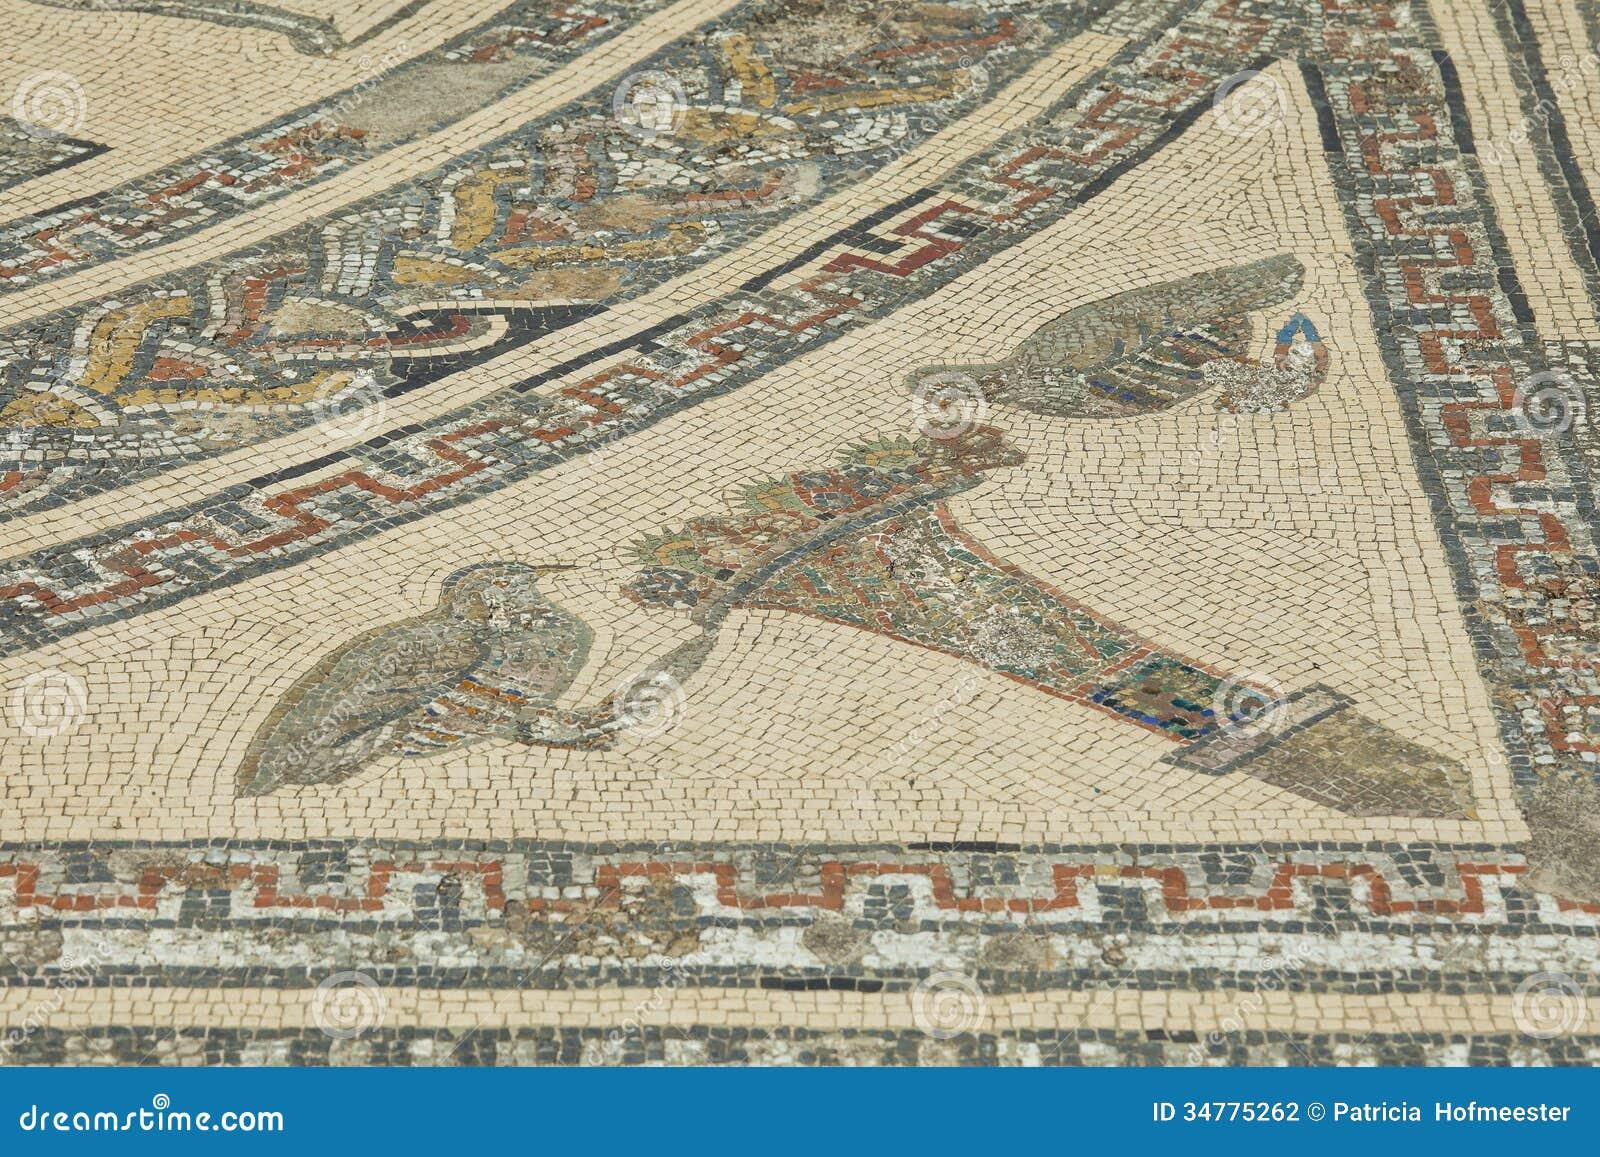 Detail of ancient roman mosaic at volubilis stock photography image 34775262 - Maison romaine antique ...